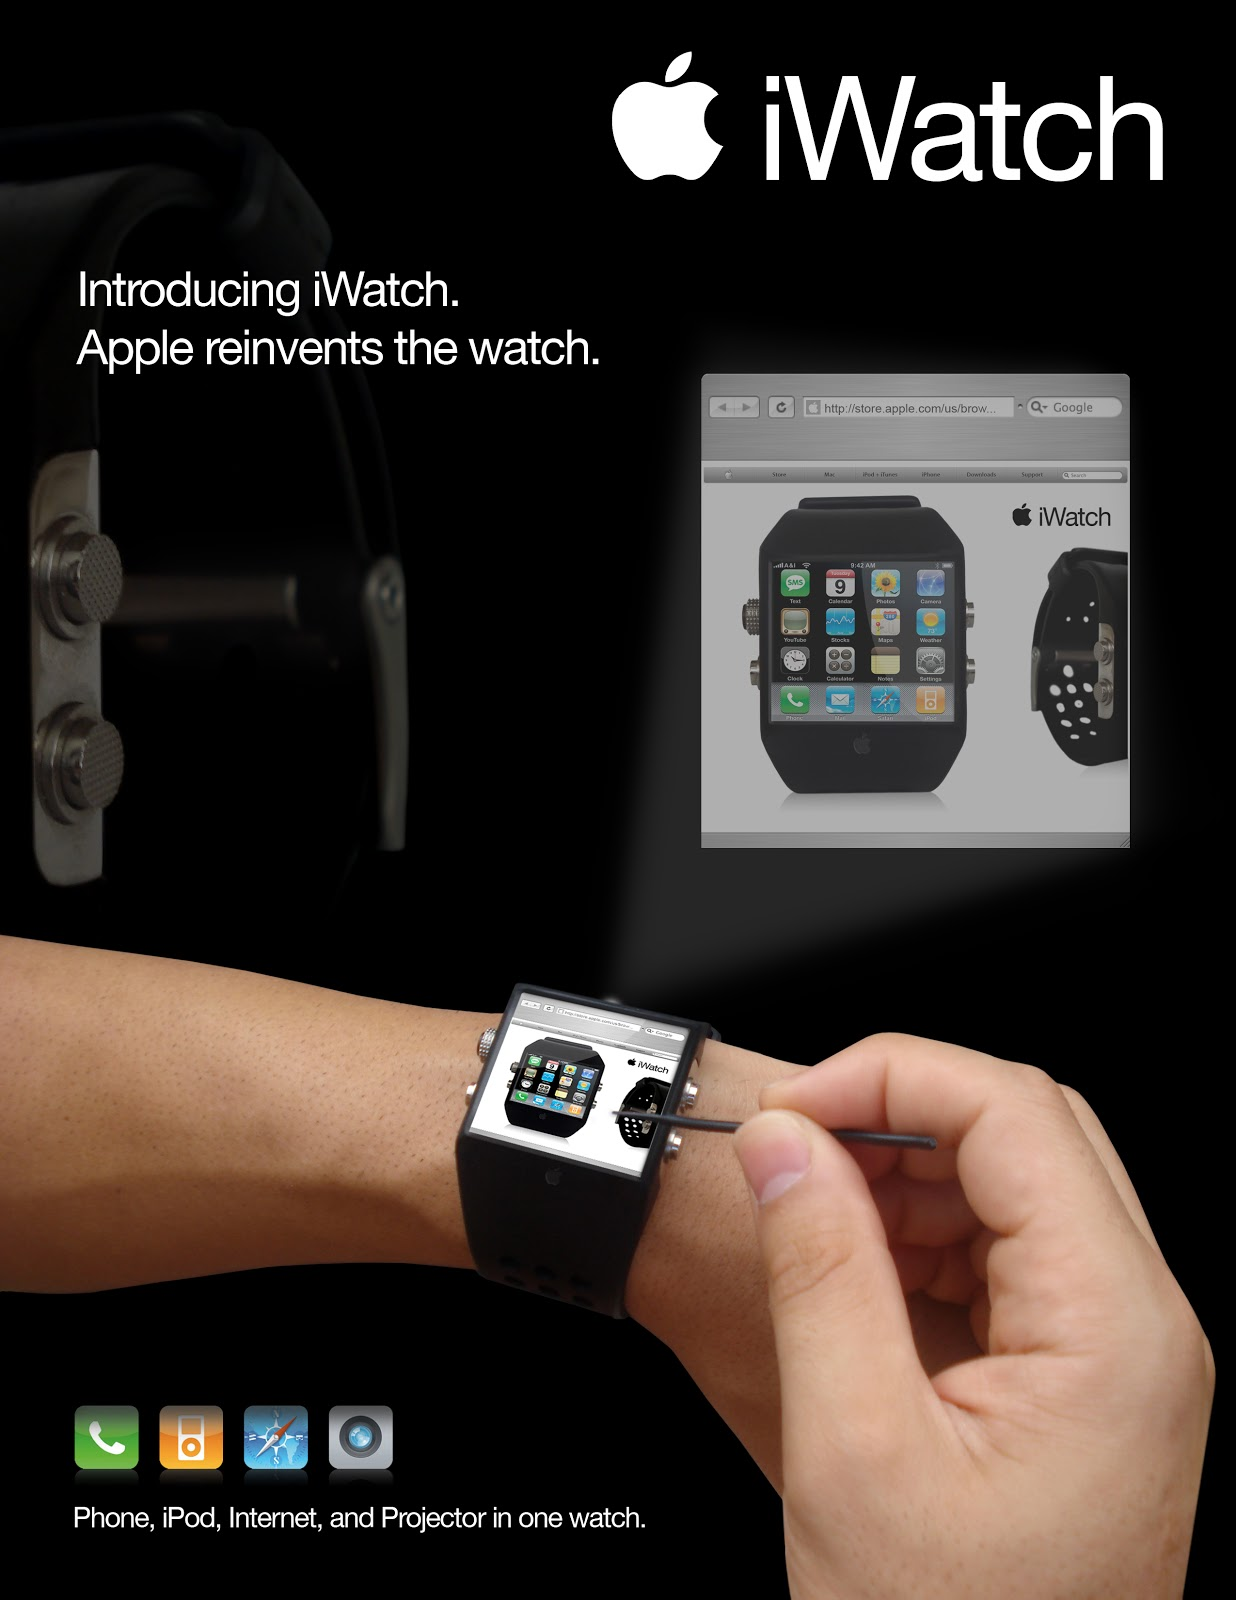 Tim-Cook-Himself-Believes-a-Smart-Watch-Is-a-Better-Solution-than-Google-Glass-2